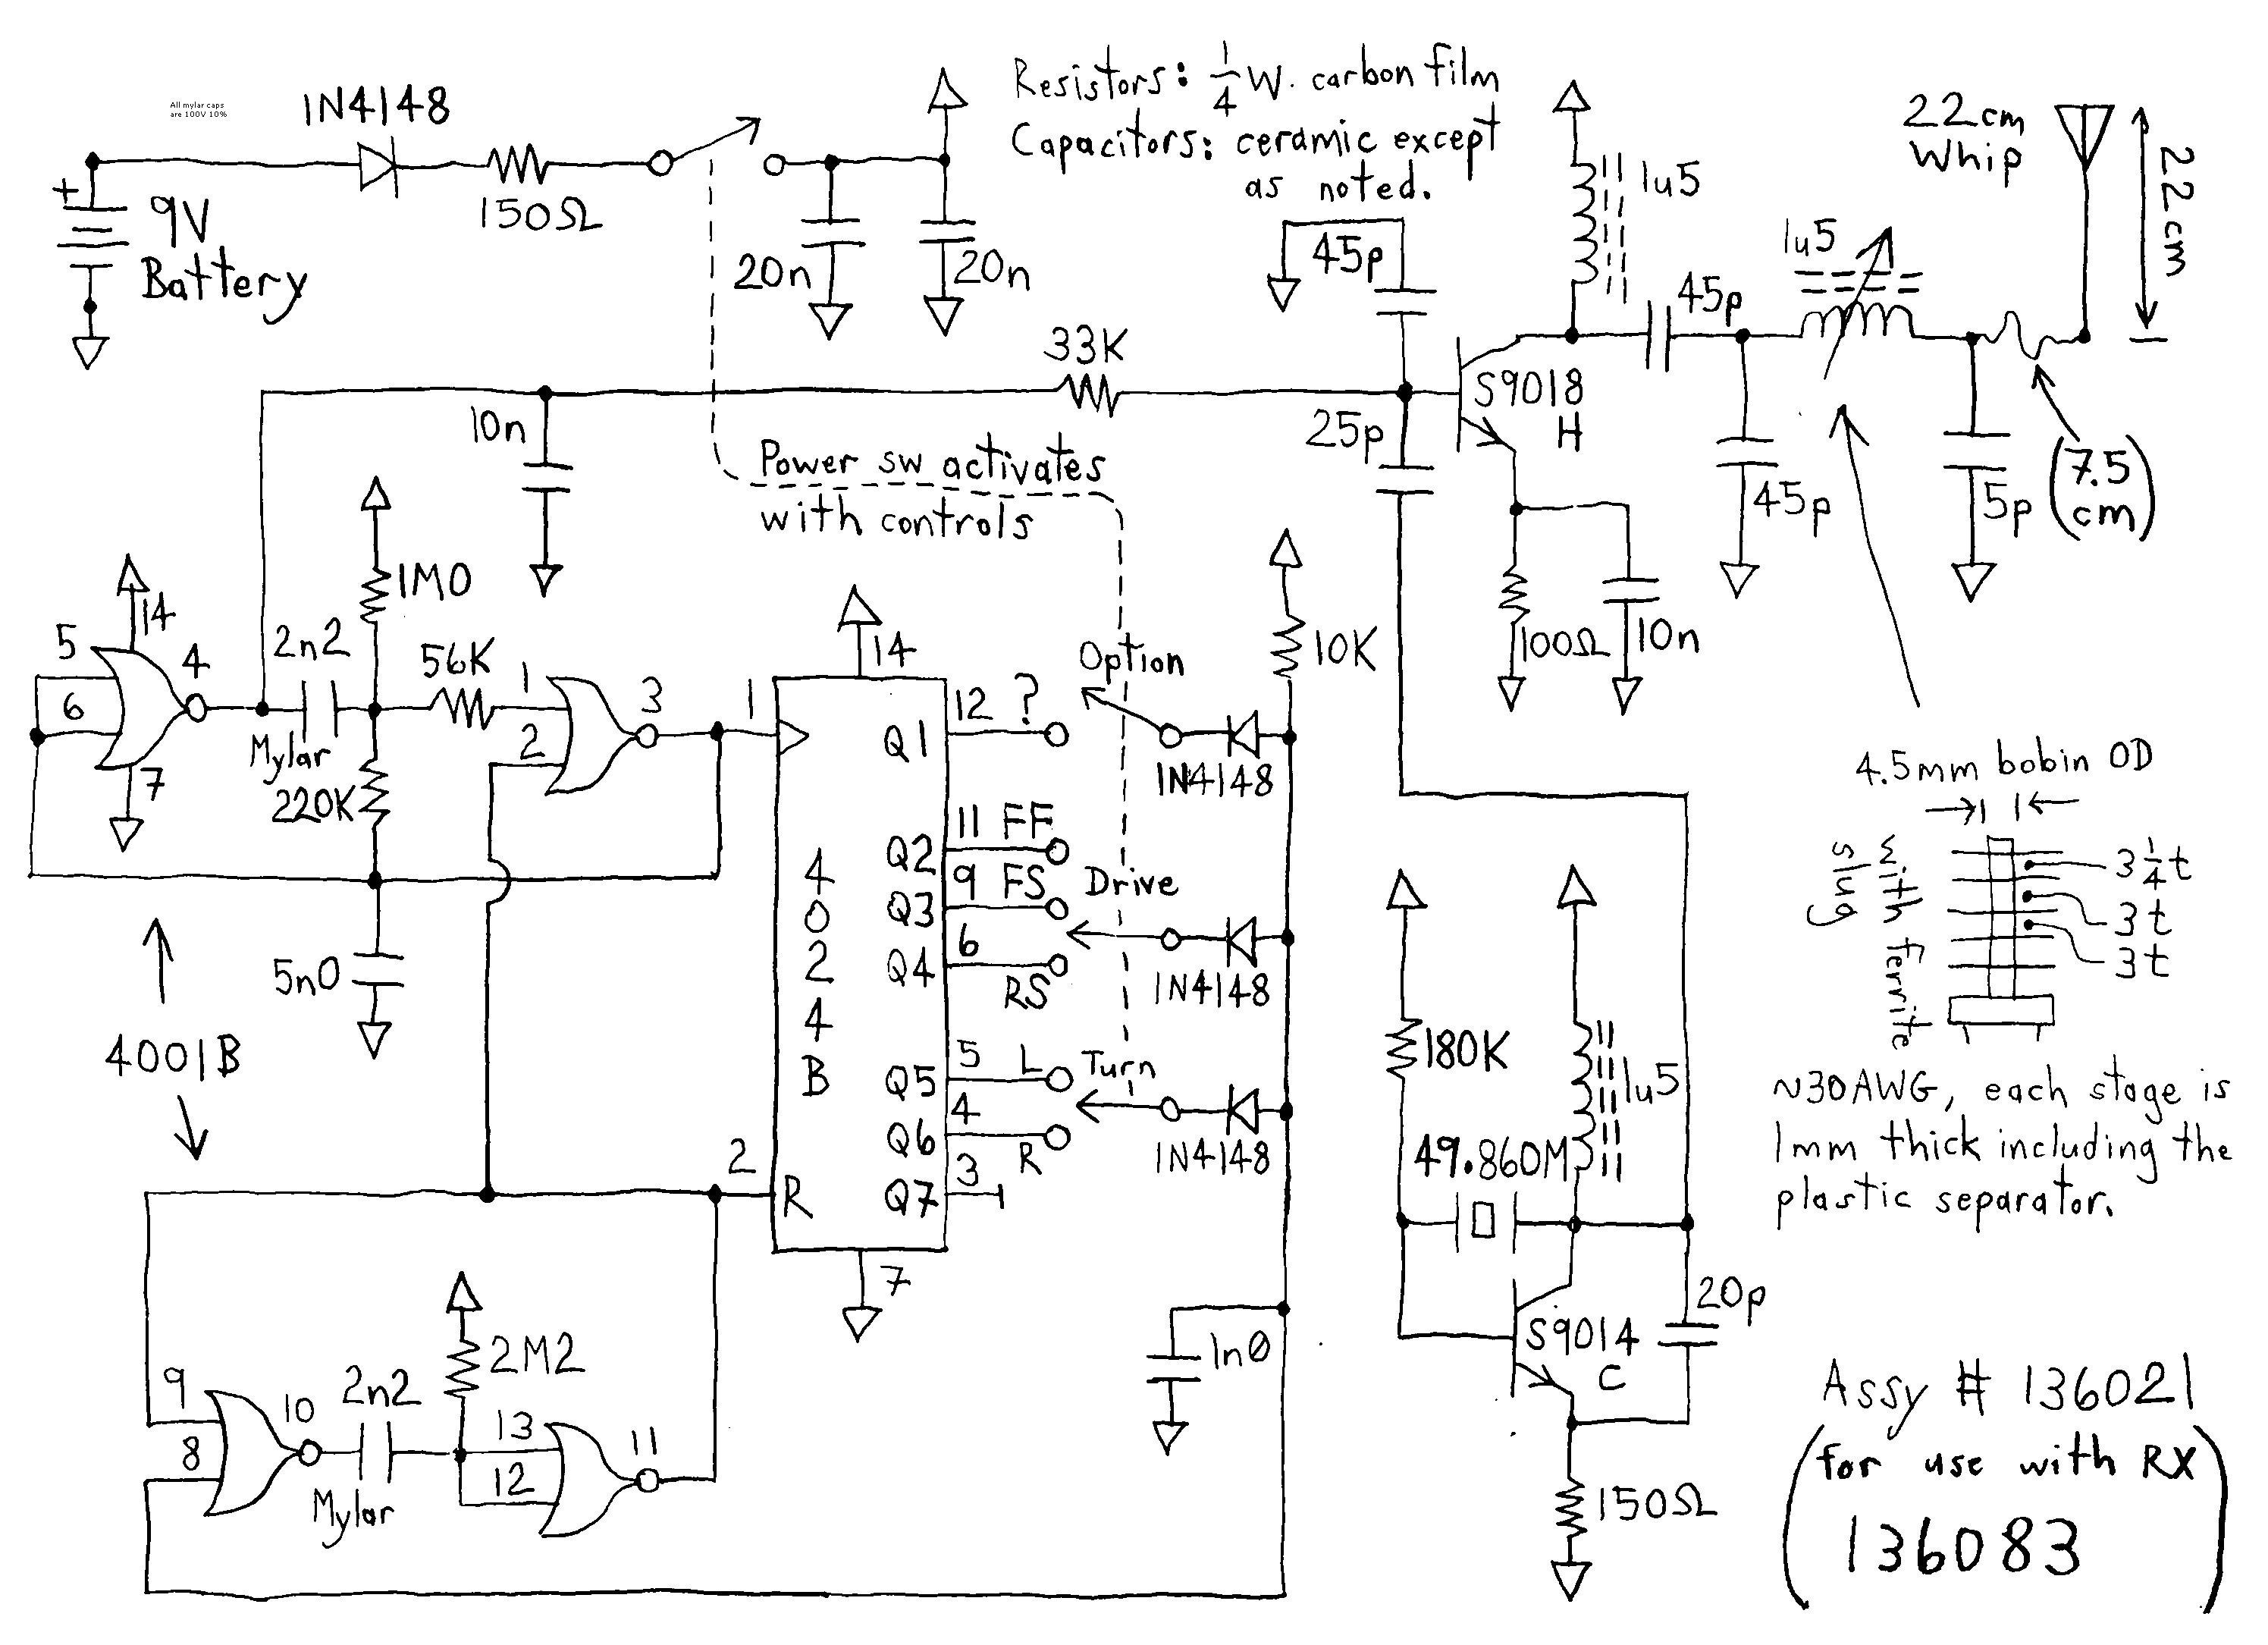 Automotive Car Wiring Diagram New Vehicle Wiring Diagram Symbols Best Rc Car Wiring Diagram Alivna